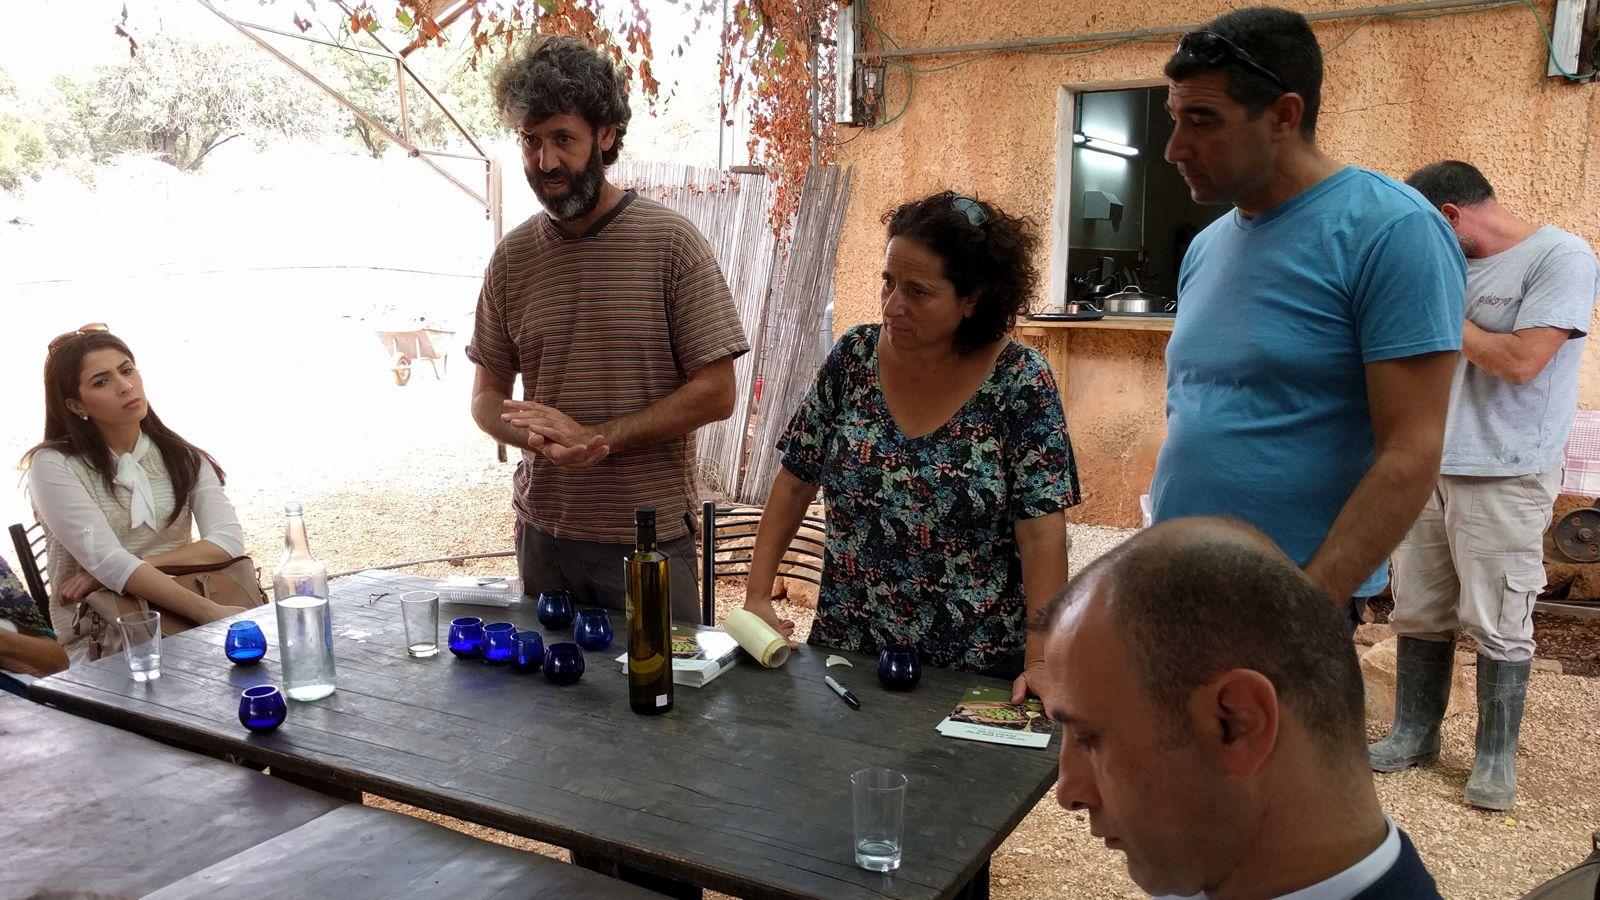 Oil tastings at Ein Camonim. Photo by Viva Sarah Press